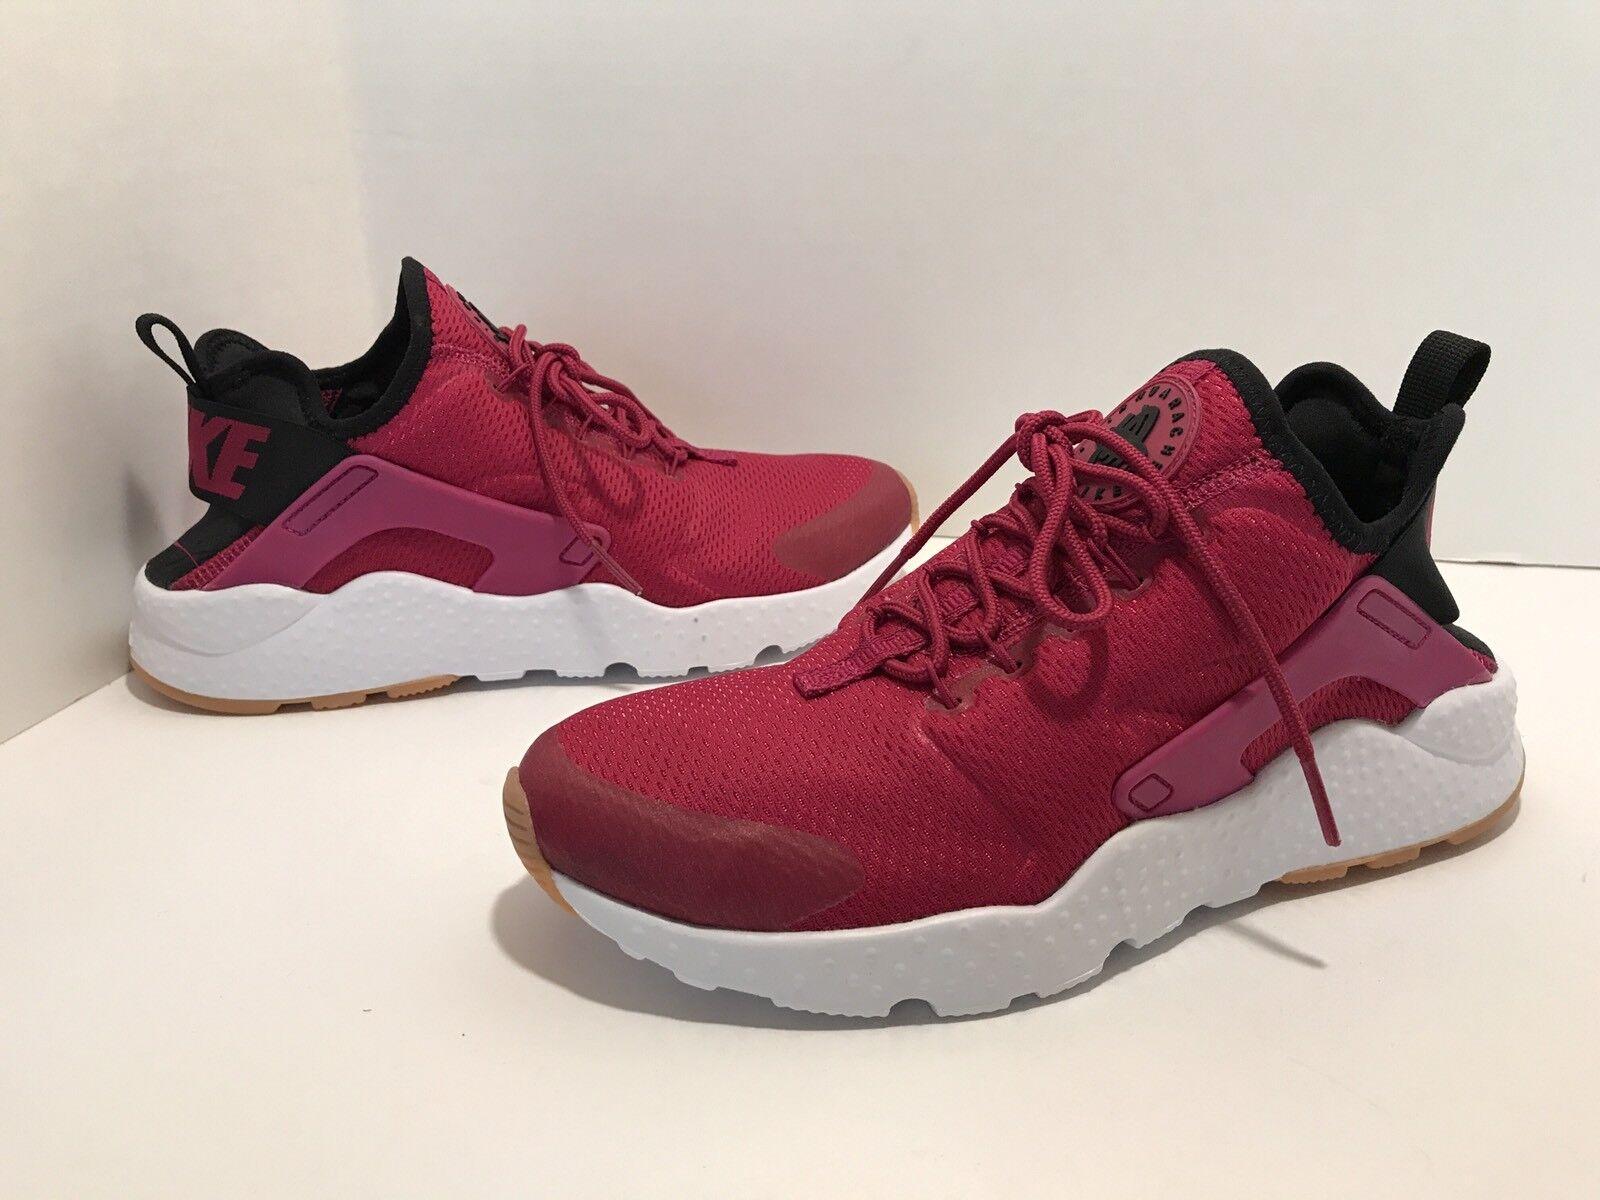 Nike libera tr forma 5 donne donne donne che i formatori 704674 402 scarpe, scarpe aafc8c